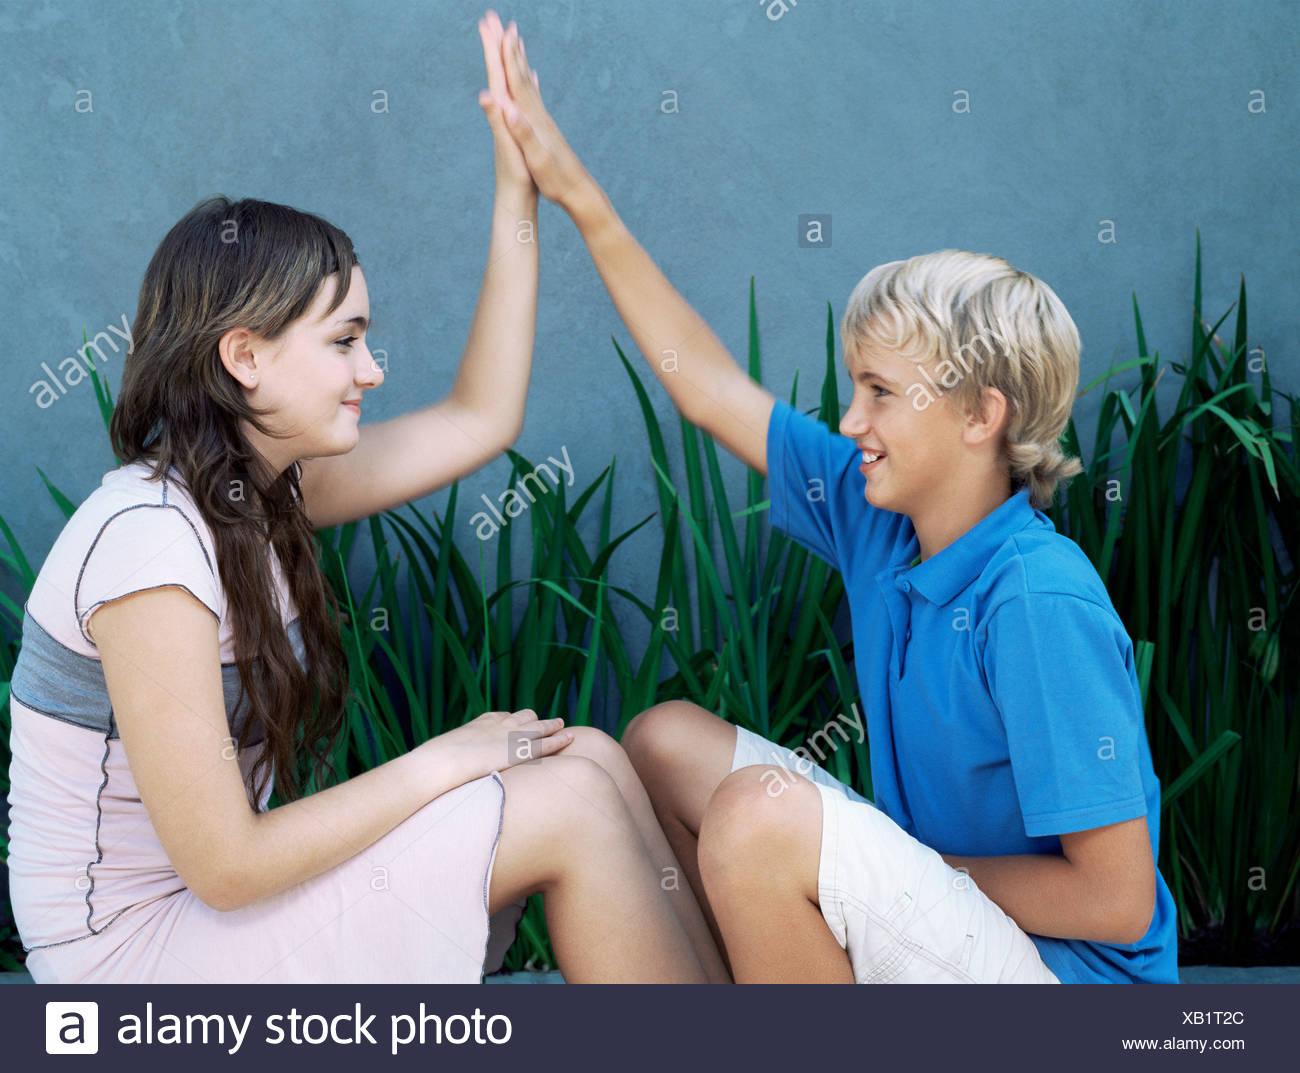 Boy and girl doing high five - Stock Image